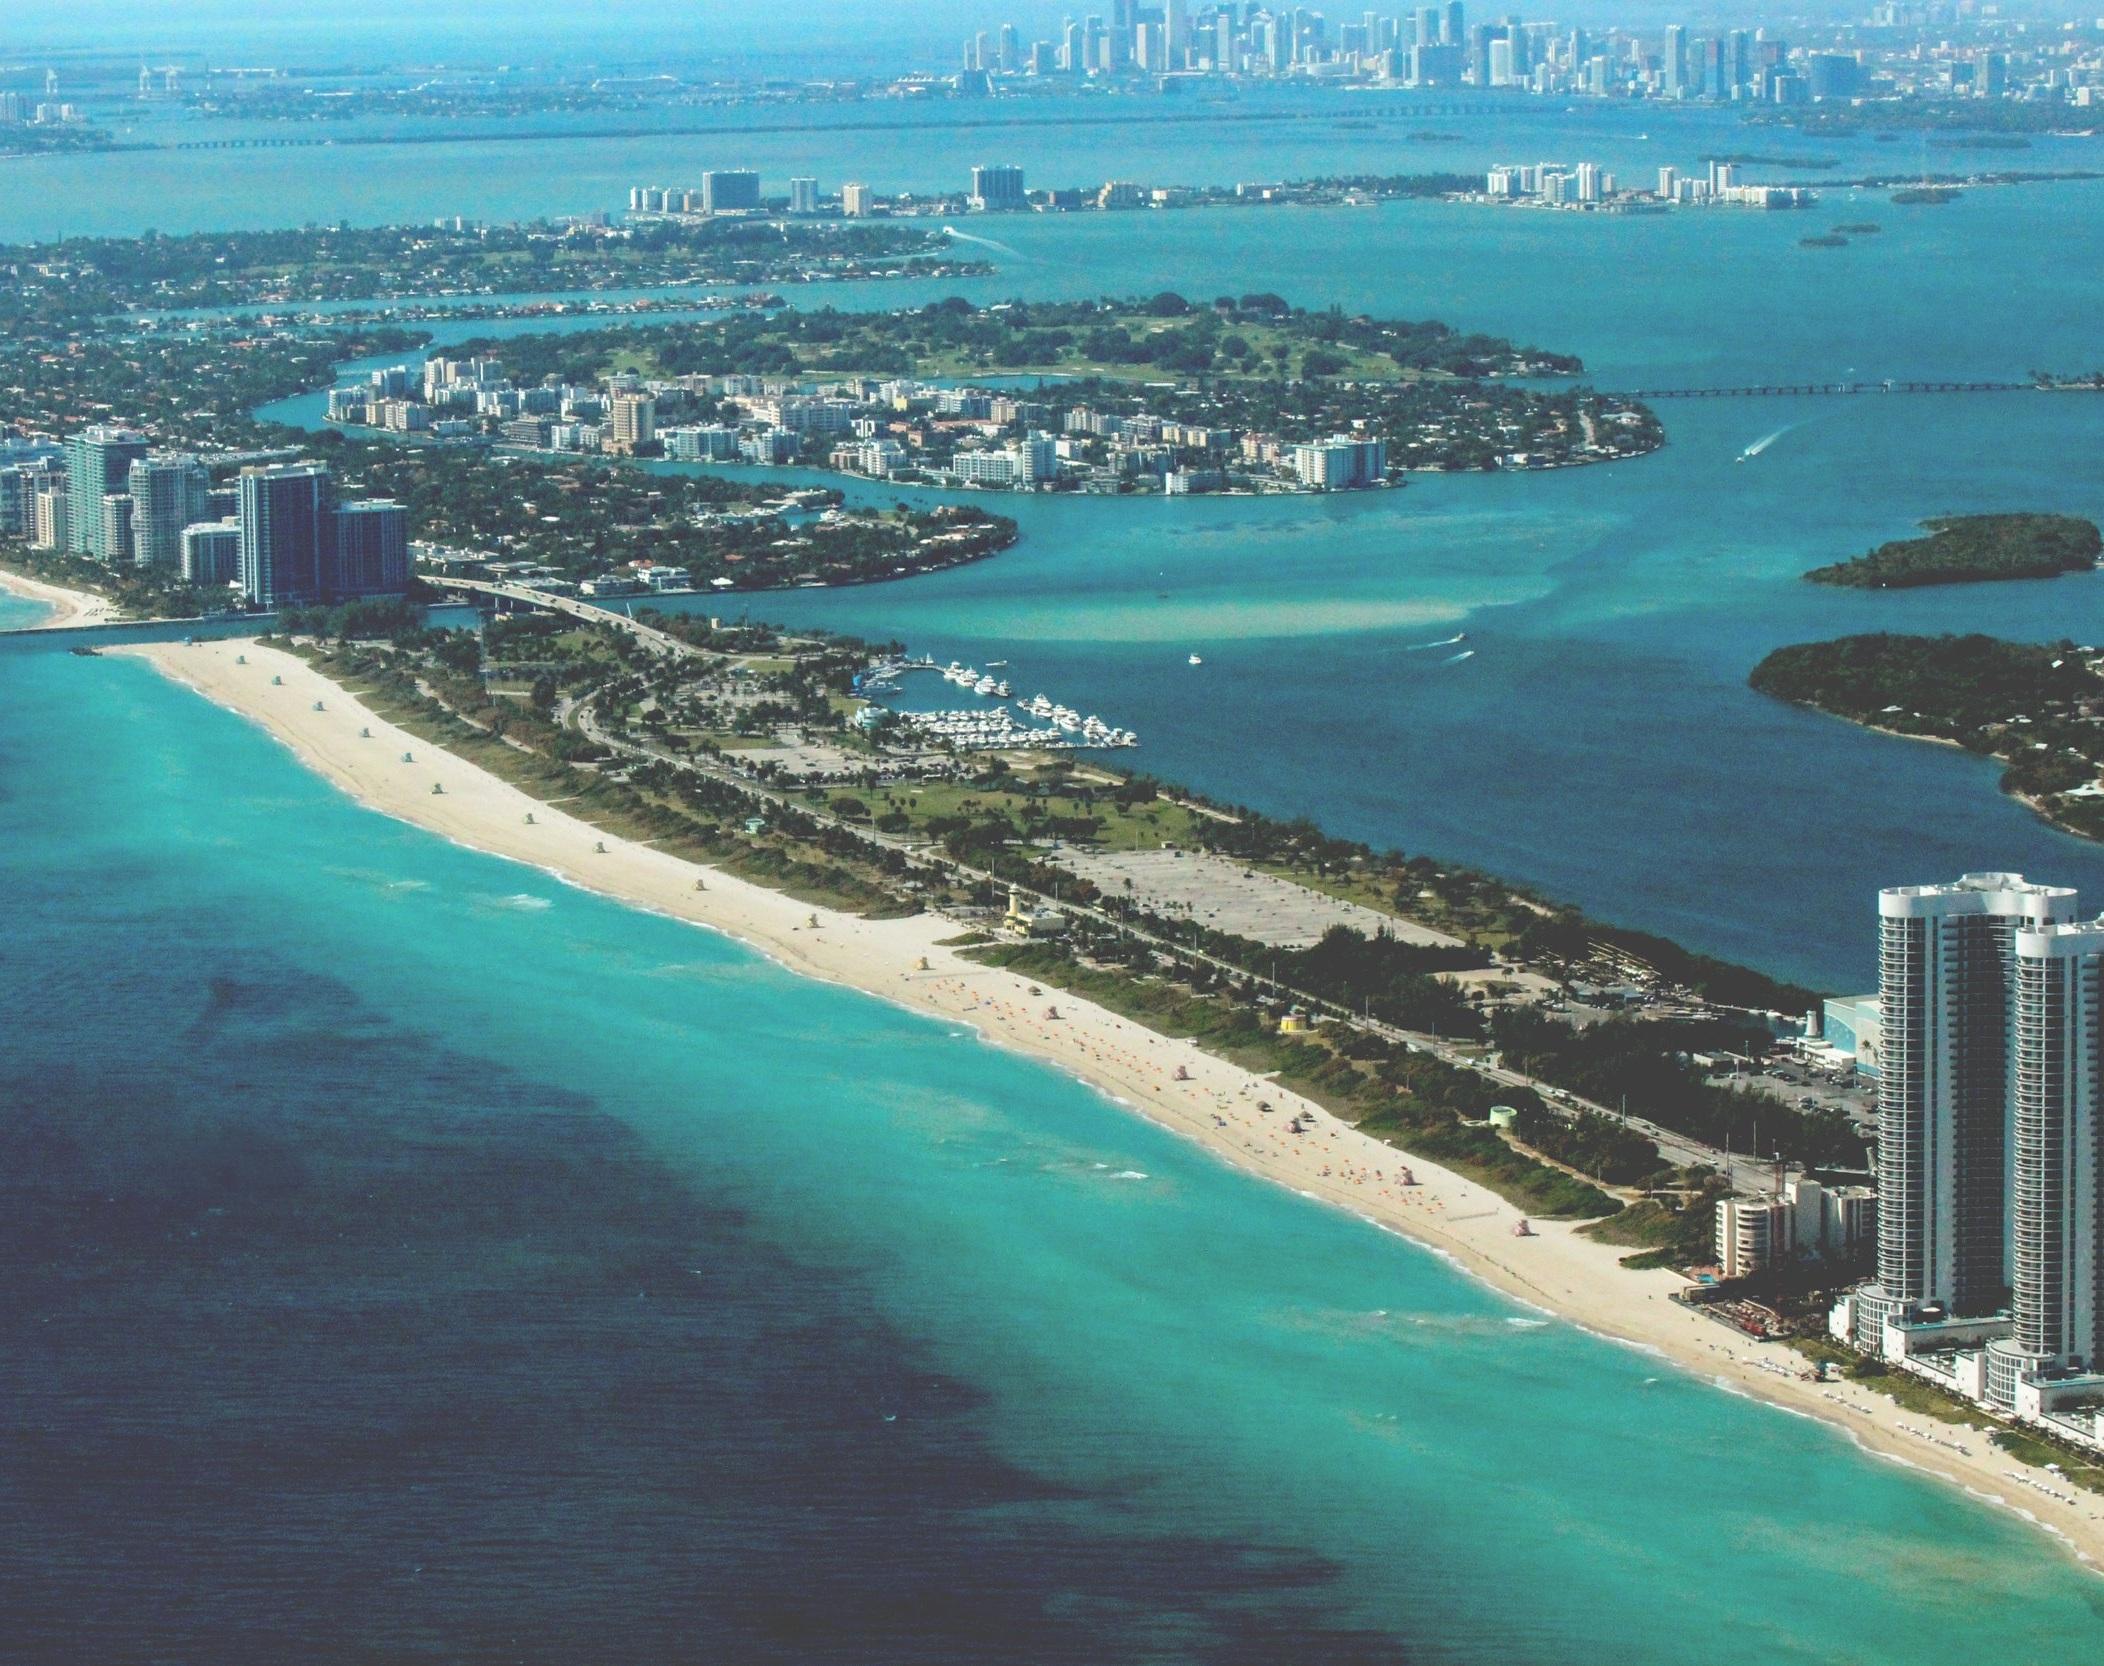 Miami+Cruise+Port.jpg